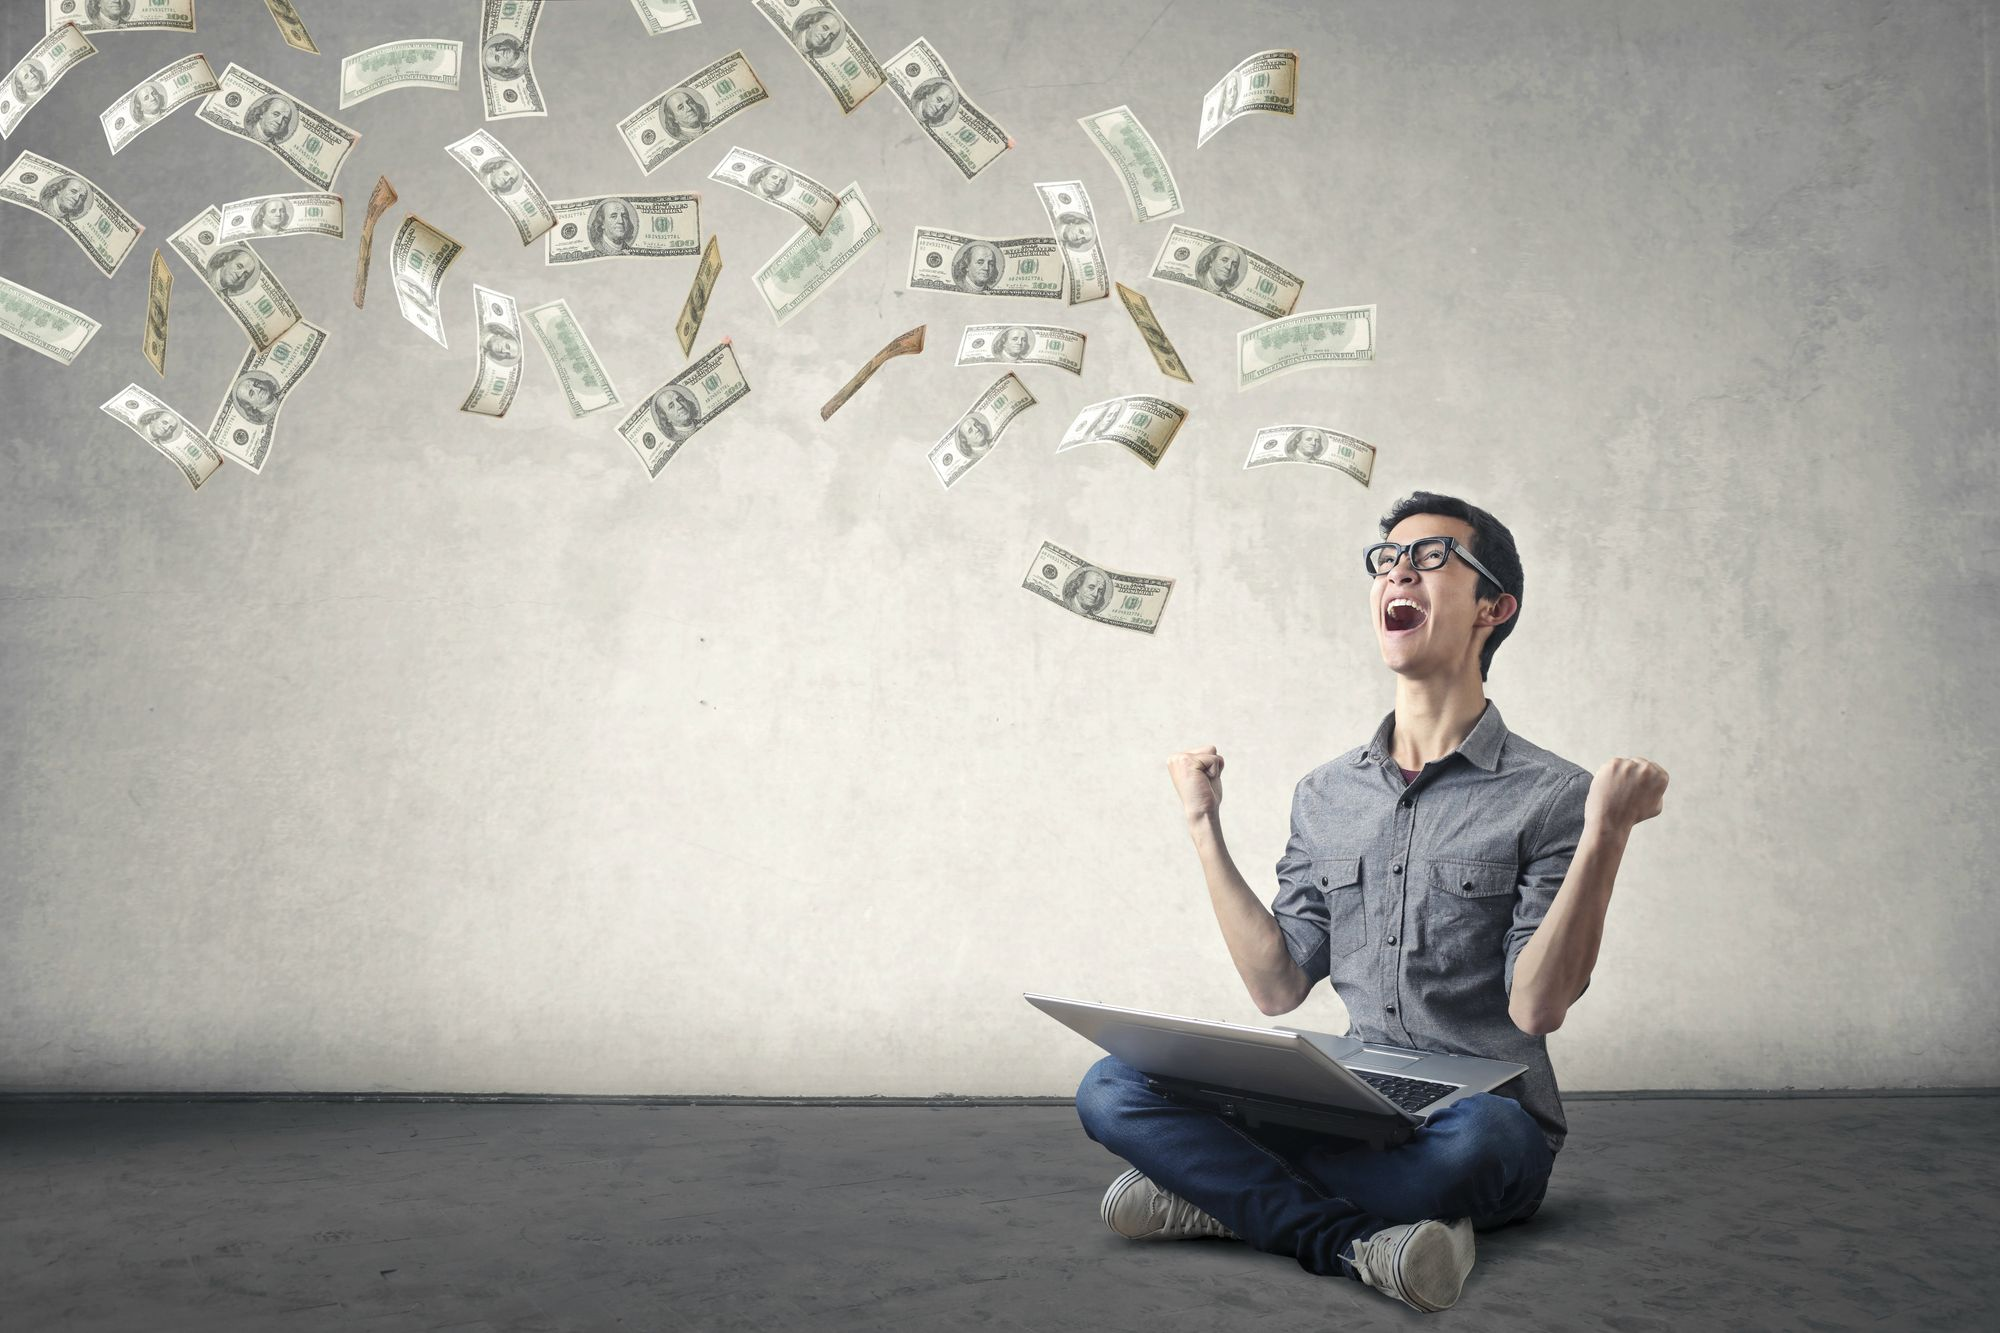 The Complete Freelance Web Developer Guide How To Make Money Through Freelance Programming Jobs